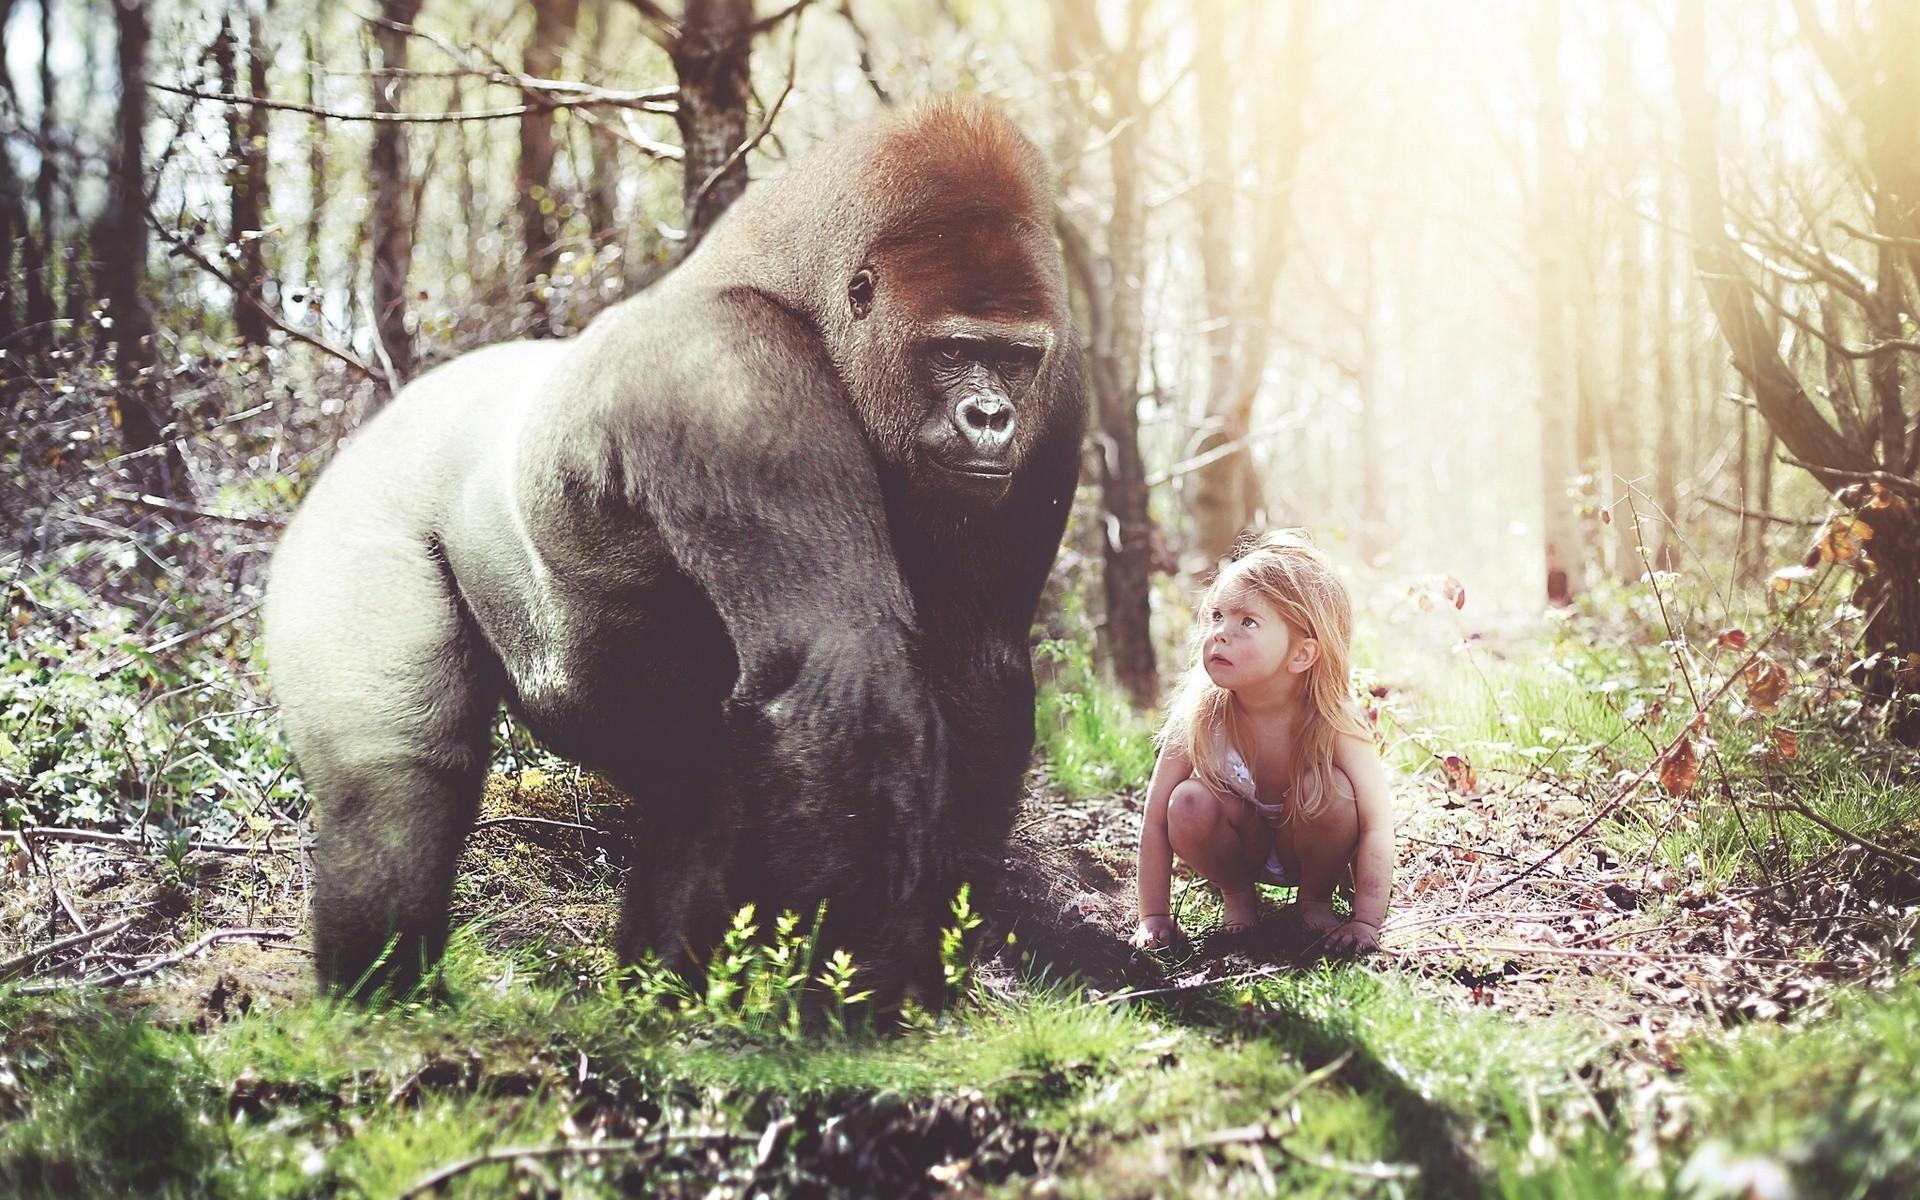 gorilla monkey images, silverback gorilla